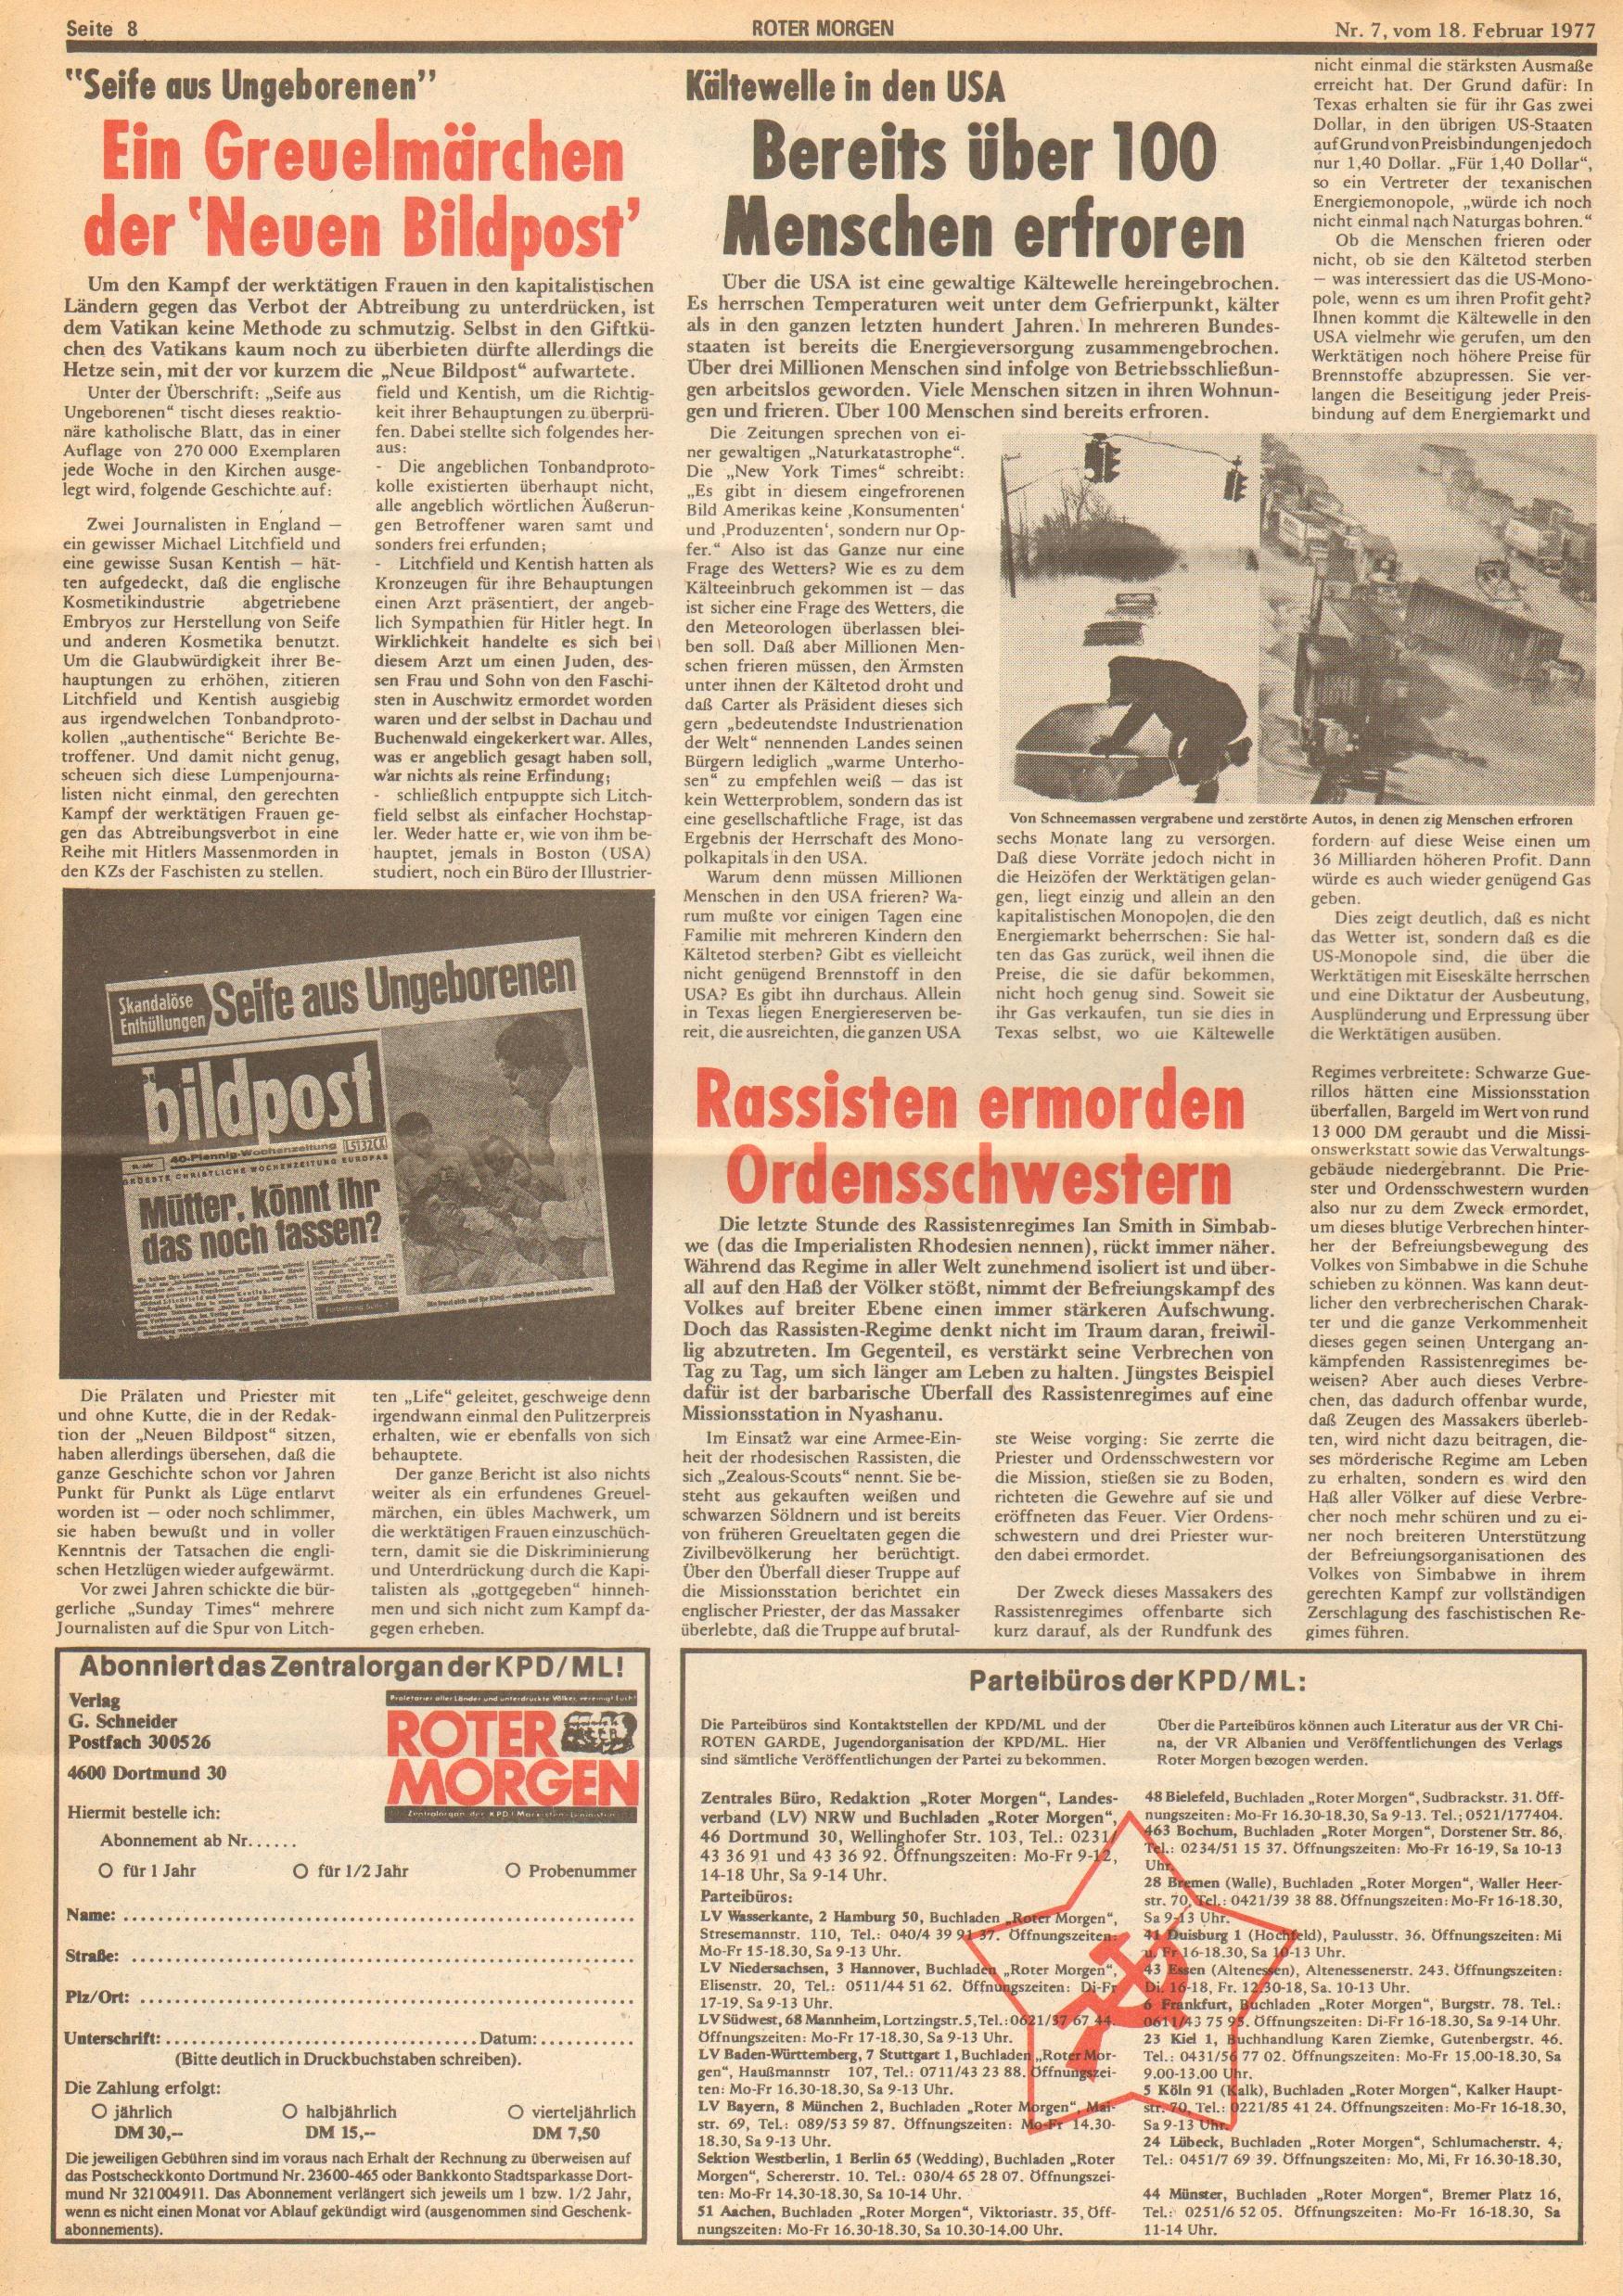 Roter Morgen, 11. Jg., 18. Februar 1977, Nr. 7, Seite 8